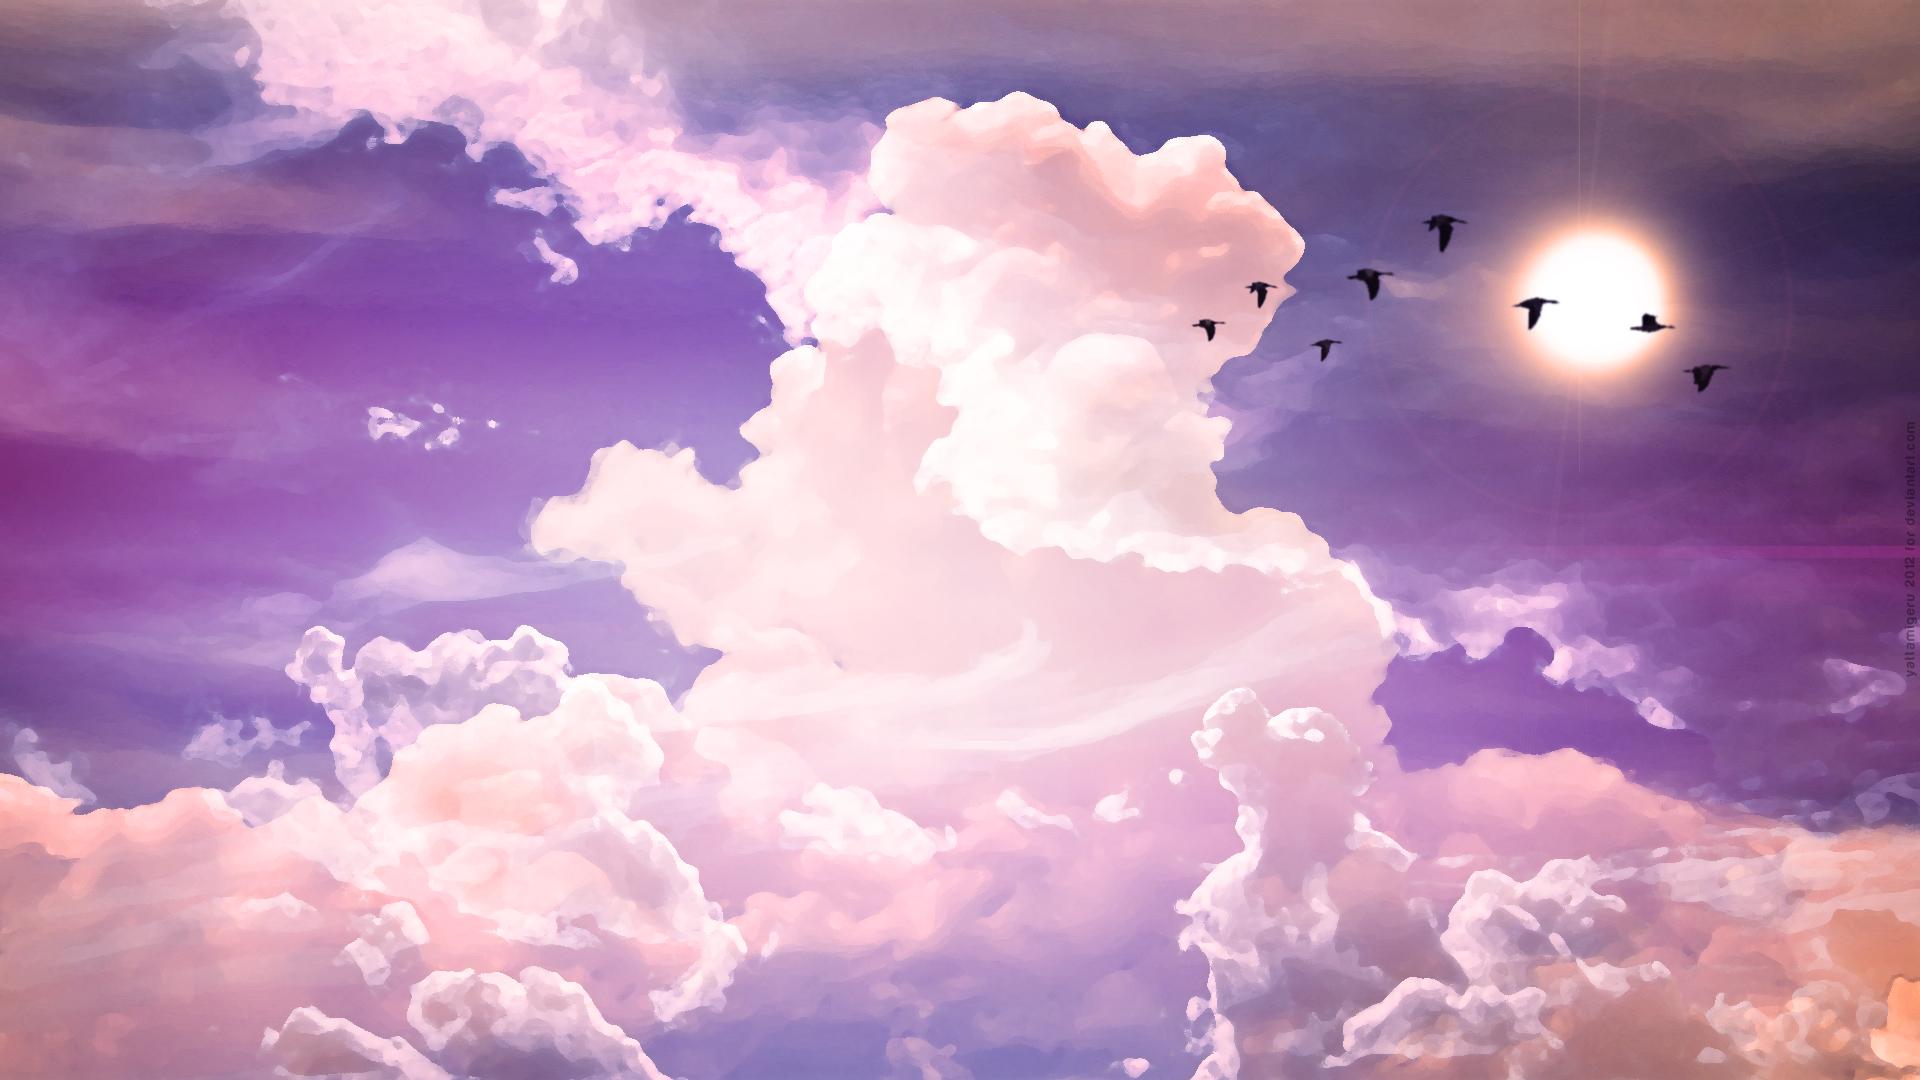 Lavender 1920x1080   Wallpaper High Definition High Quality 1920x1080